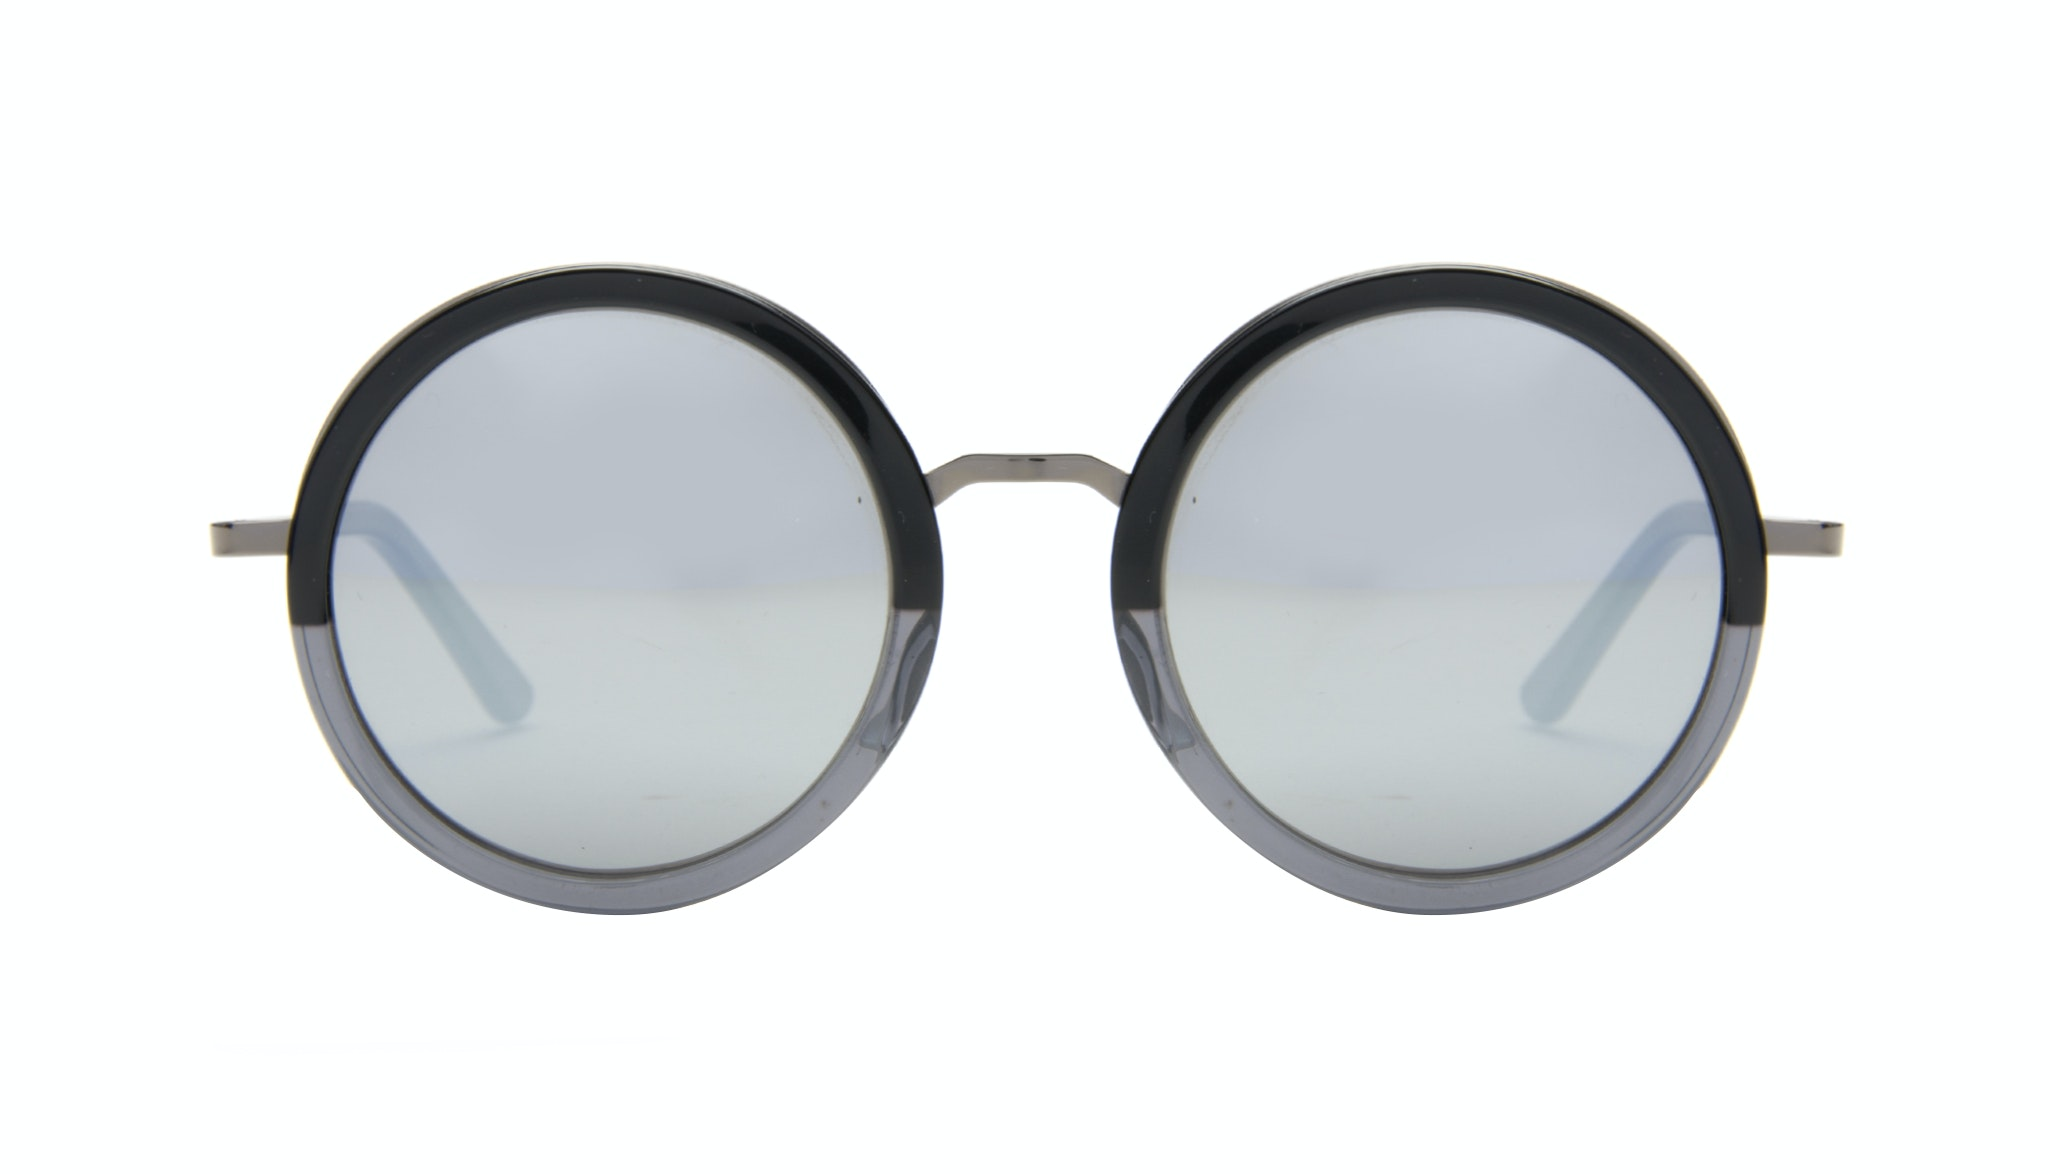 Affordable Fashion Glasses Round Sunglasses Women Balance shadow-black